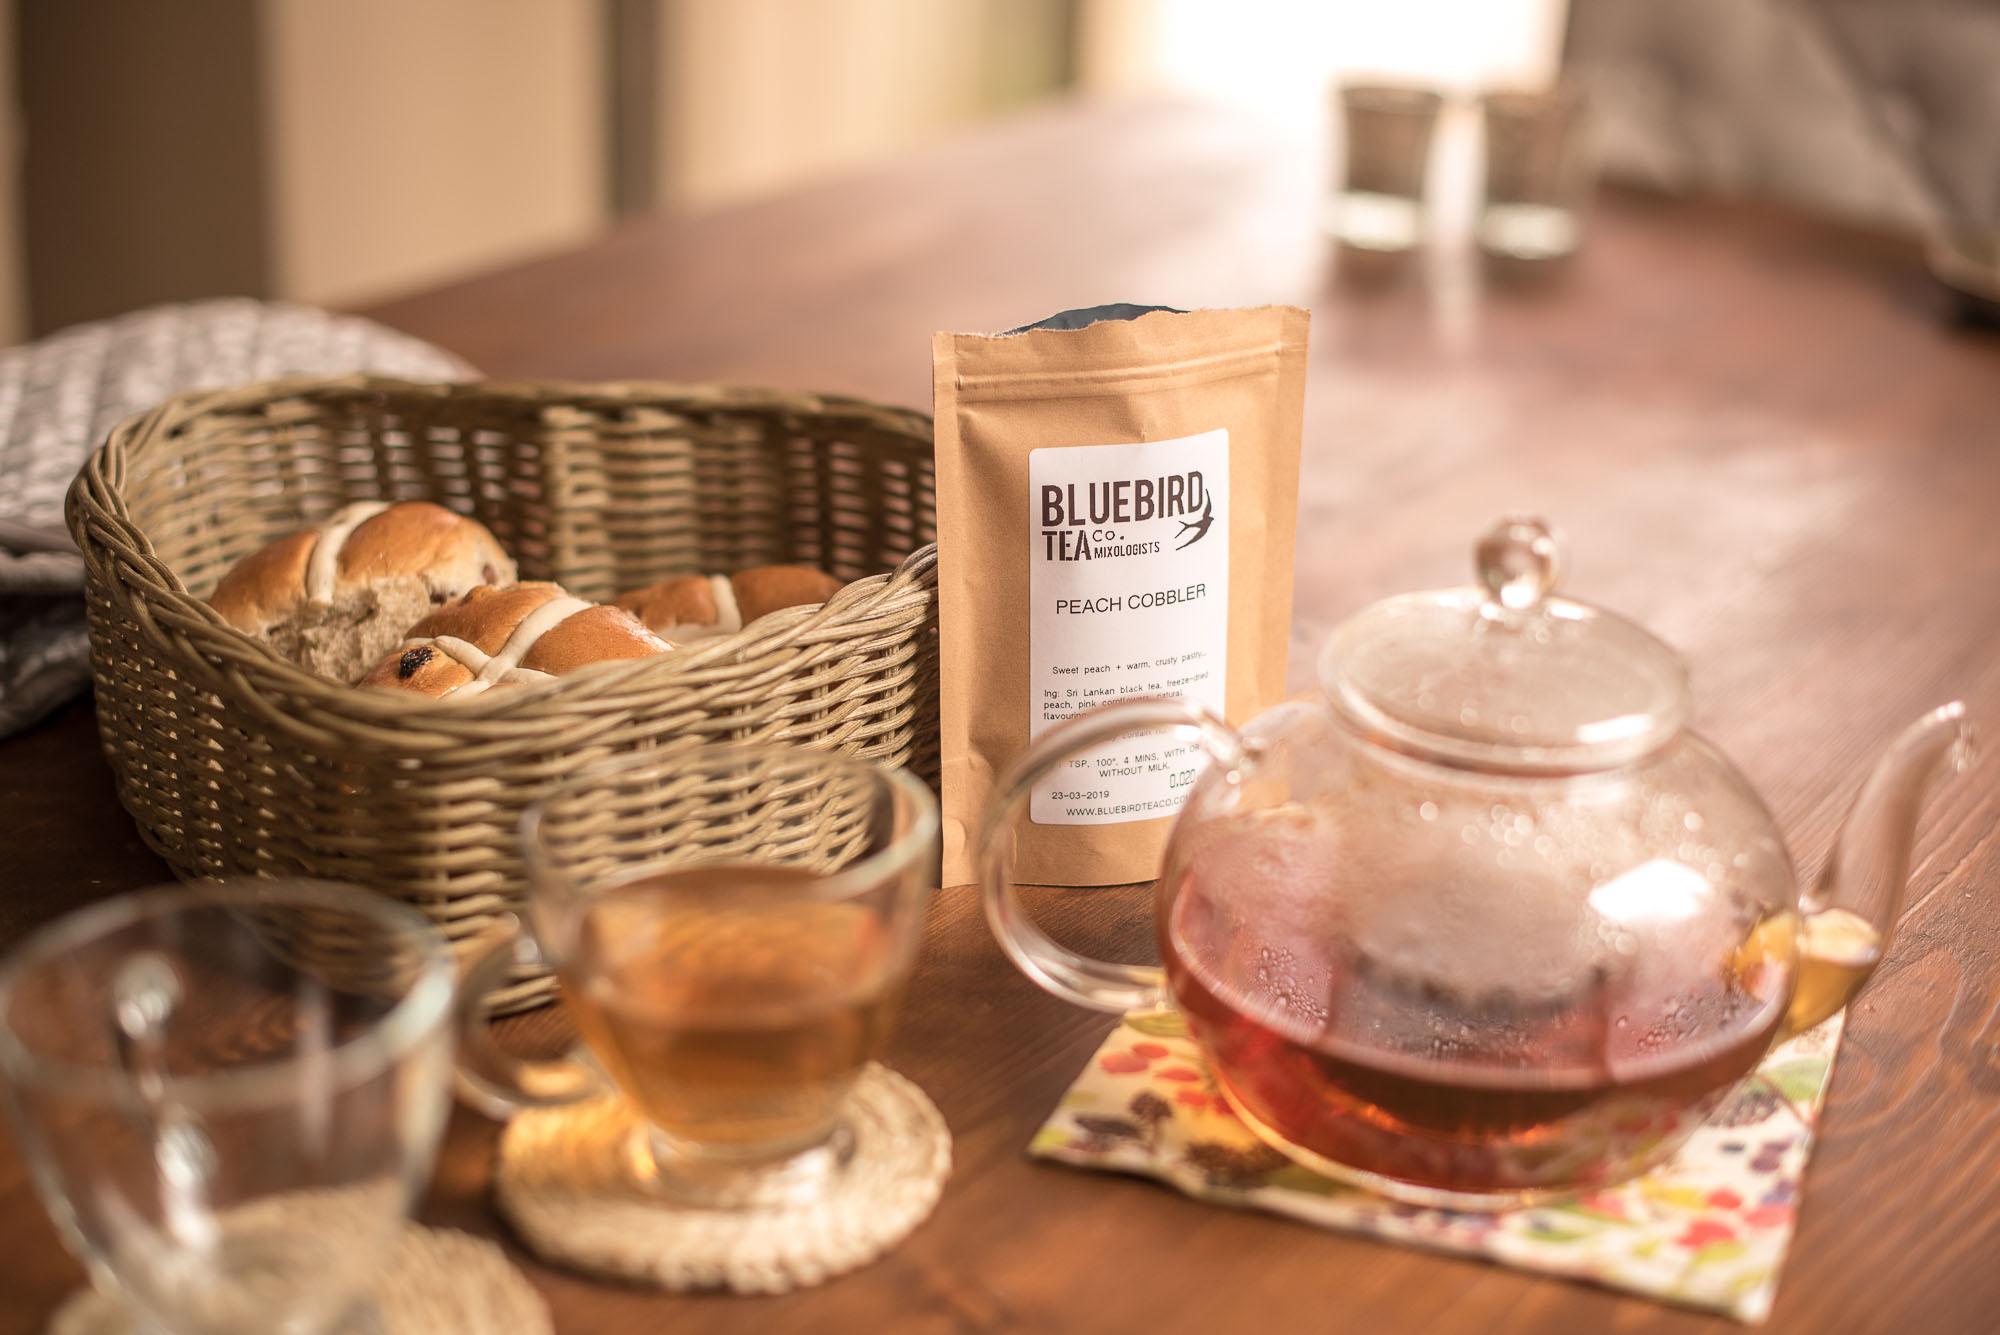 The White Company Bluebird Tea Co